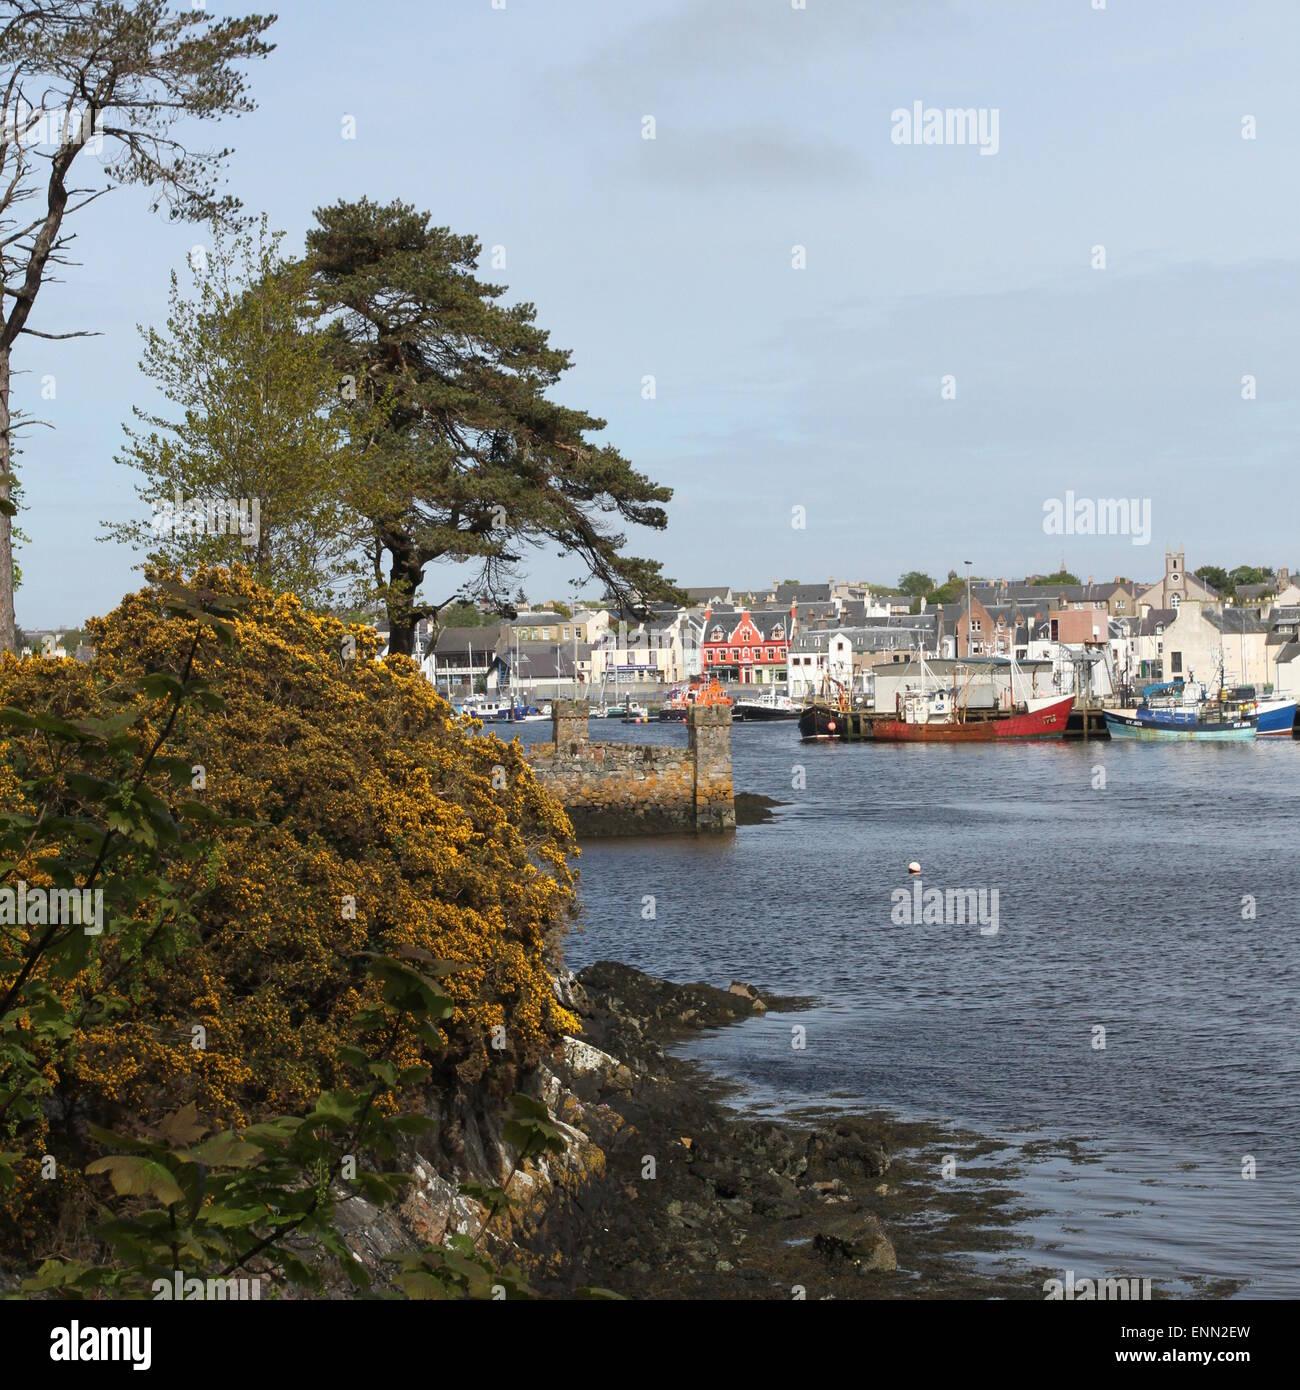 Stornoway Lewis Scotland  May 2014 - Stock Image